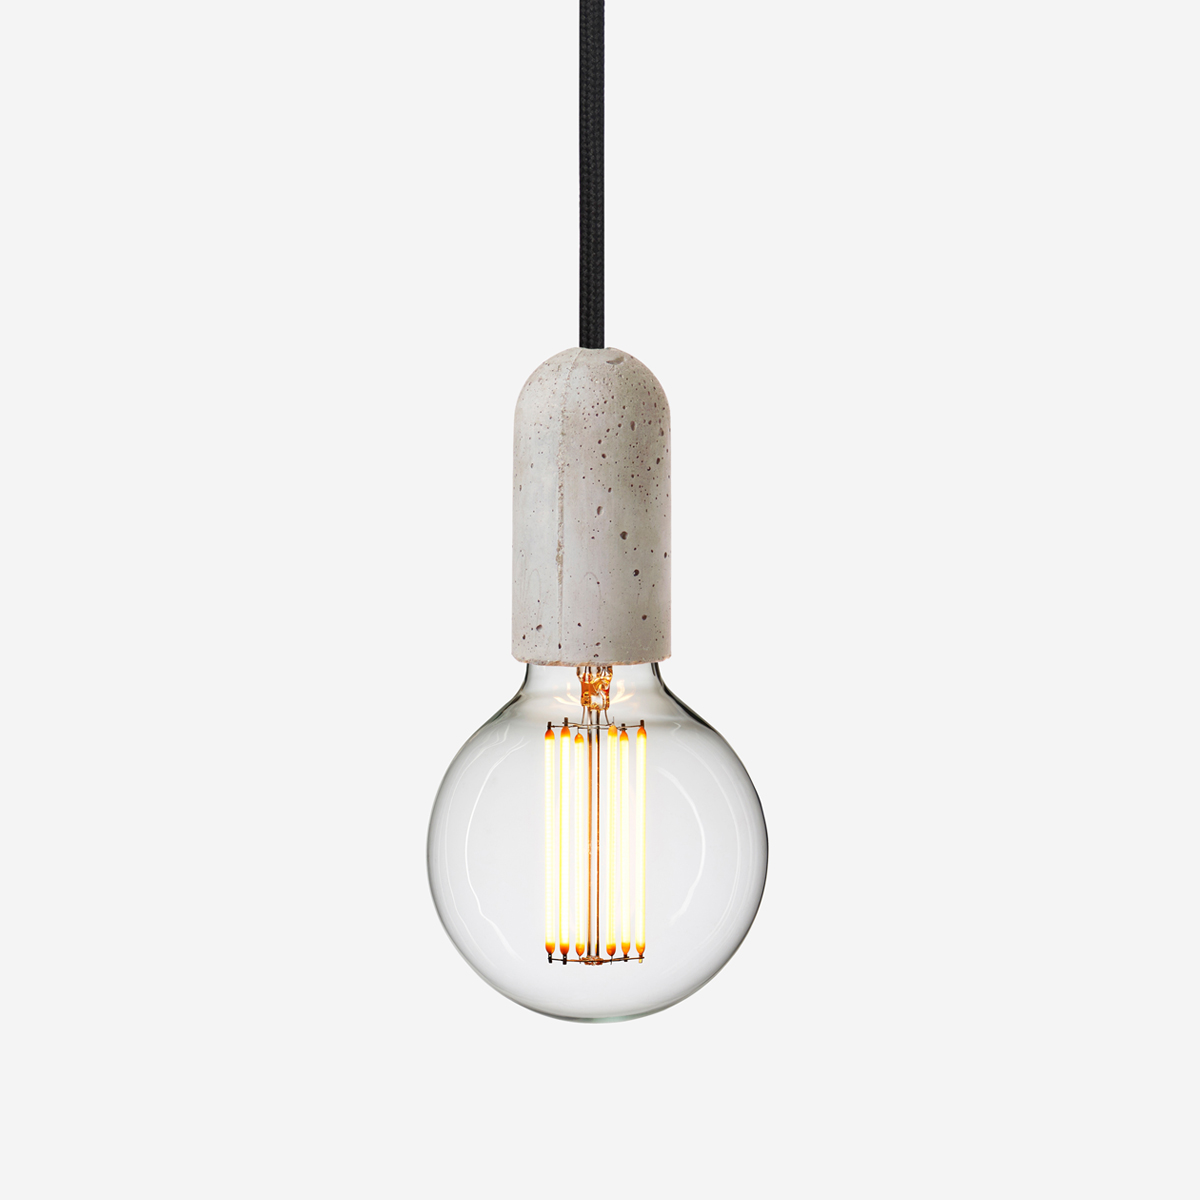 Rikiki Grafik Produkt Lampenfassung Concrete Mit Textilkabel